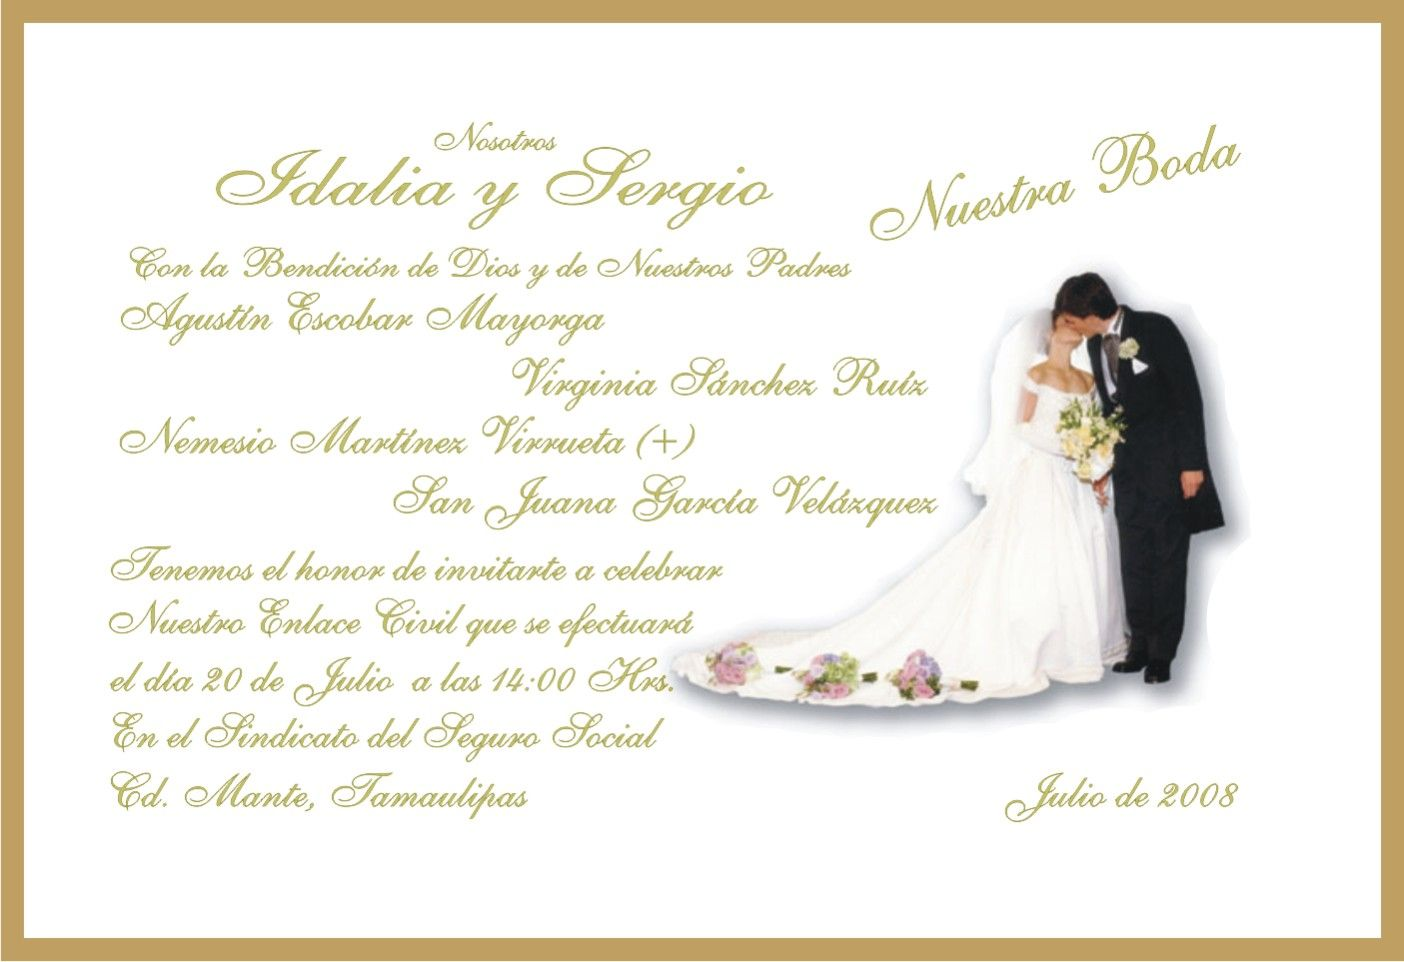 Invitaciones de boda cristiana para mandar por whatsapp 5 - Tarjeta de boda ...